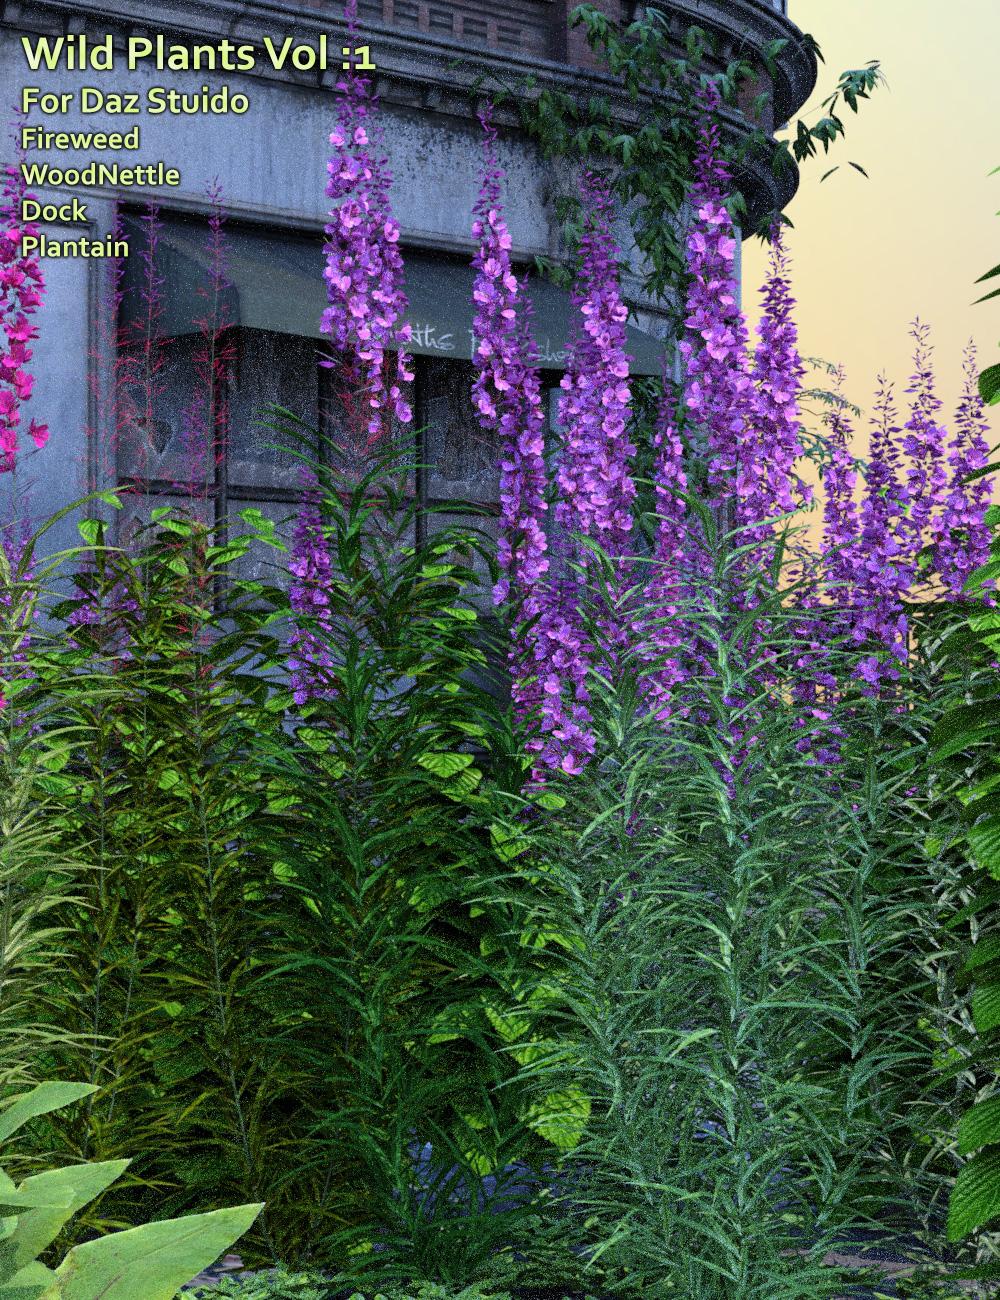 Wild Plants Vol: 1 for Daz Studio by: MartinJFrost, 3D Models by Daz 3D